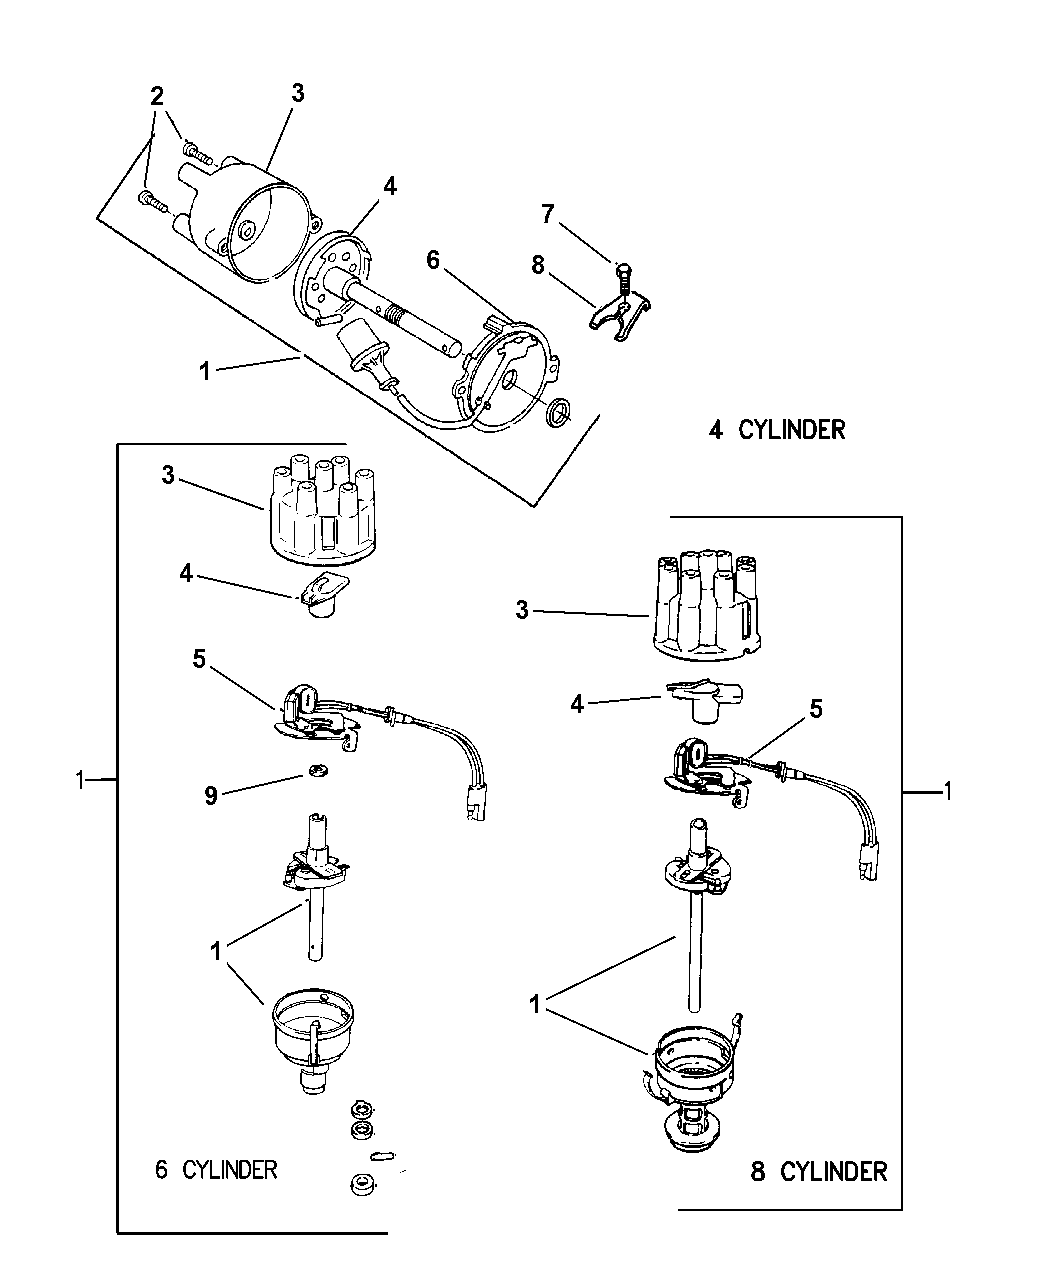 56028143 - Genuine Mopar PICKUP-DISTRIBUTOR PICK-UP